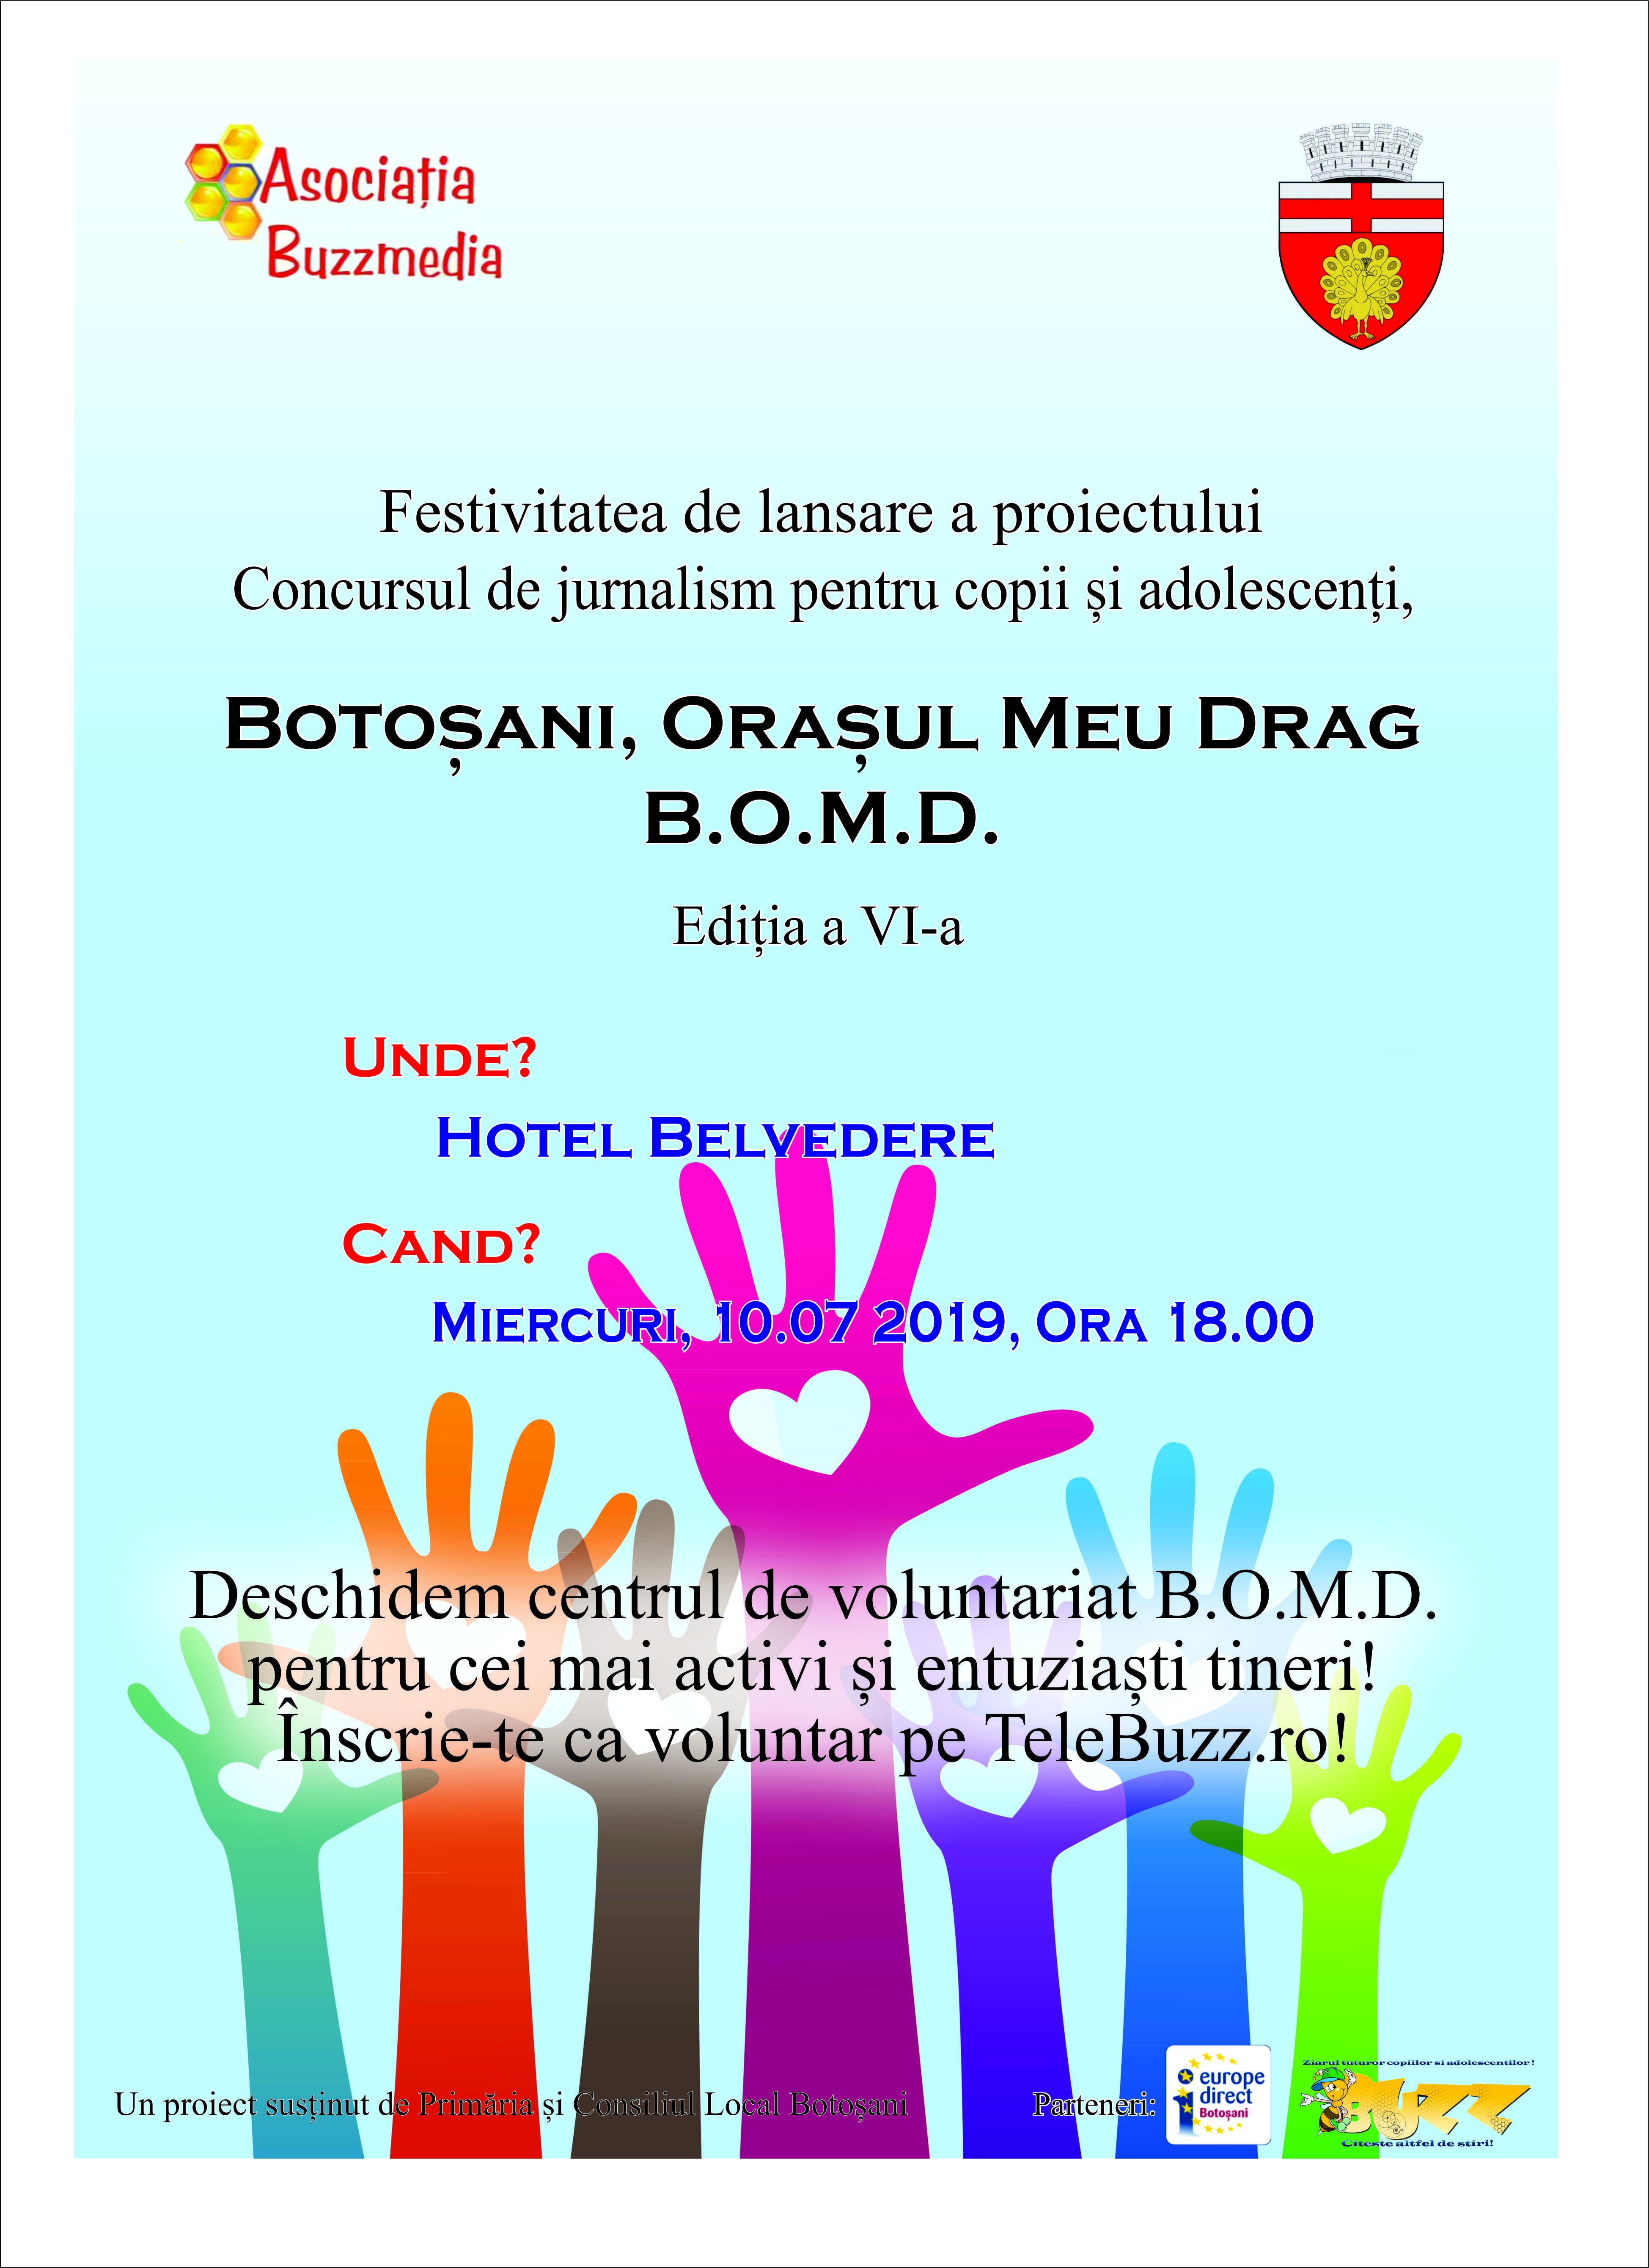 Se deschide centrul de voluntariat B.O.M.D!